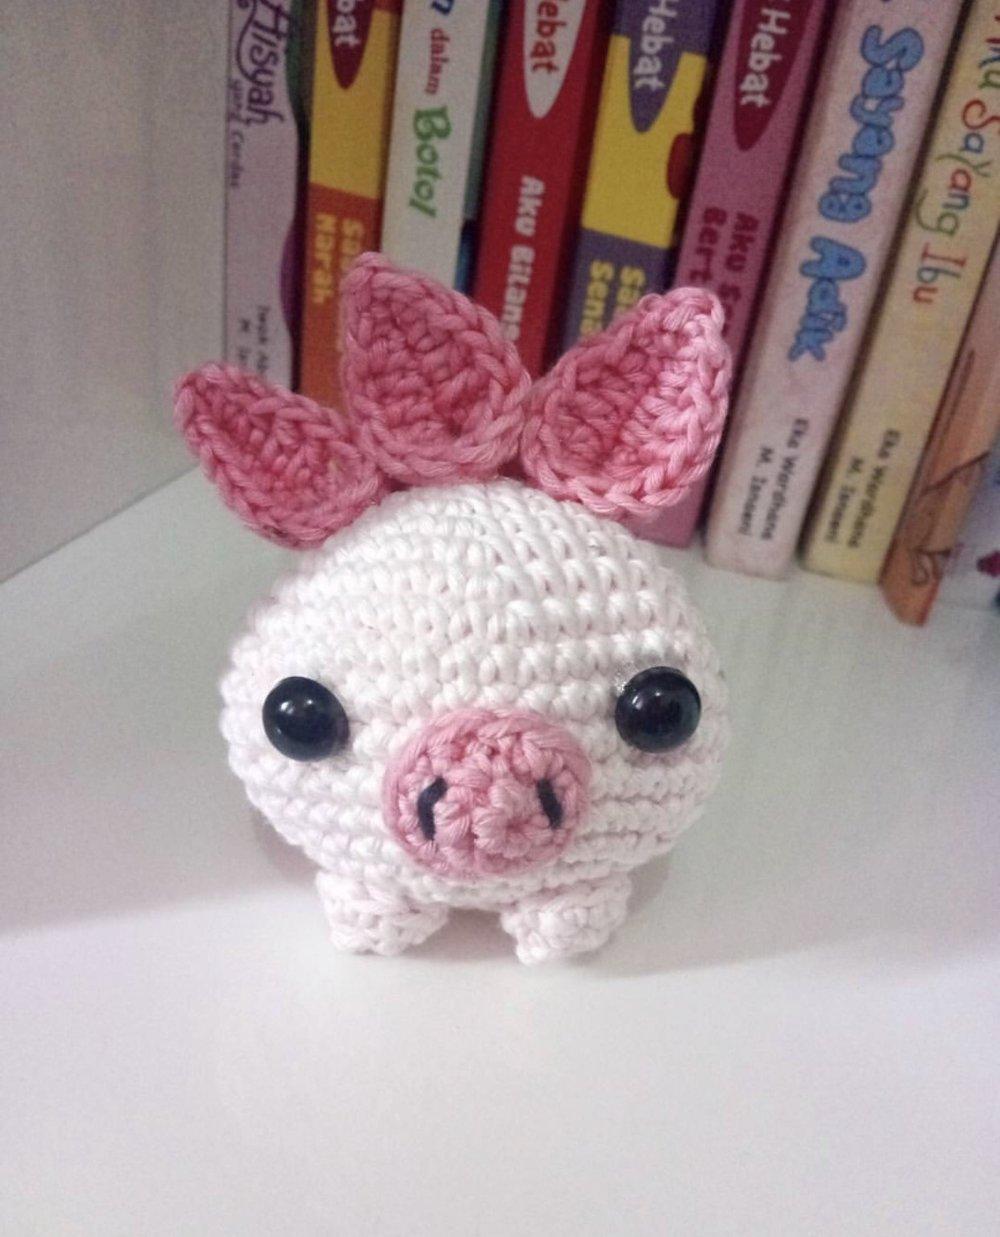 Pig Oddish made by @anjalihandmade